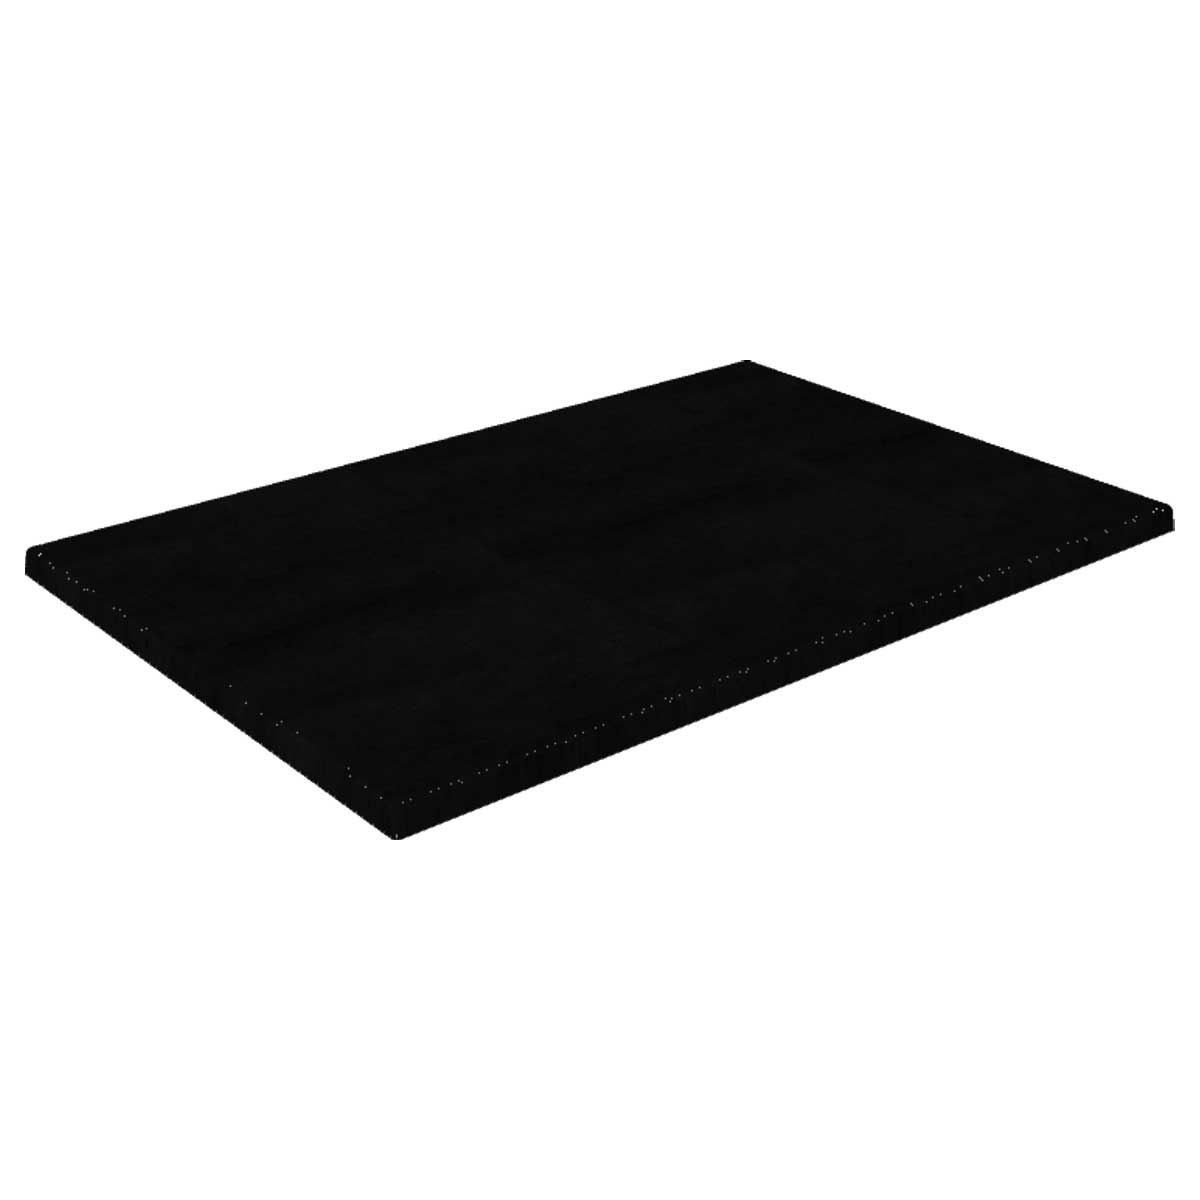 TICLA E120X80 055 - https://www.werzalit.com/fr/produit/plateau-de-table-classic-werzalit-e-70x60-055-schwarz/